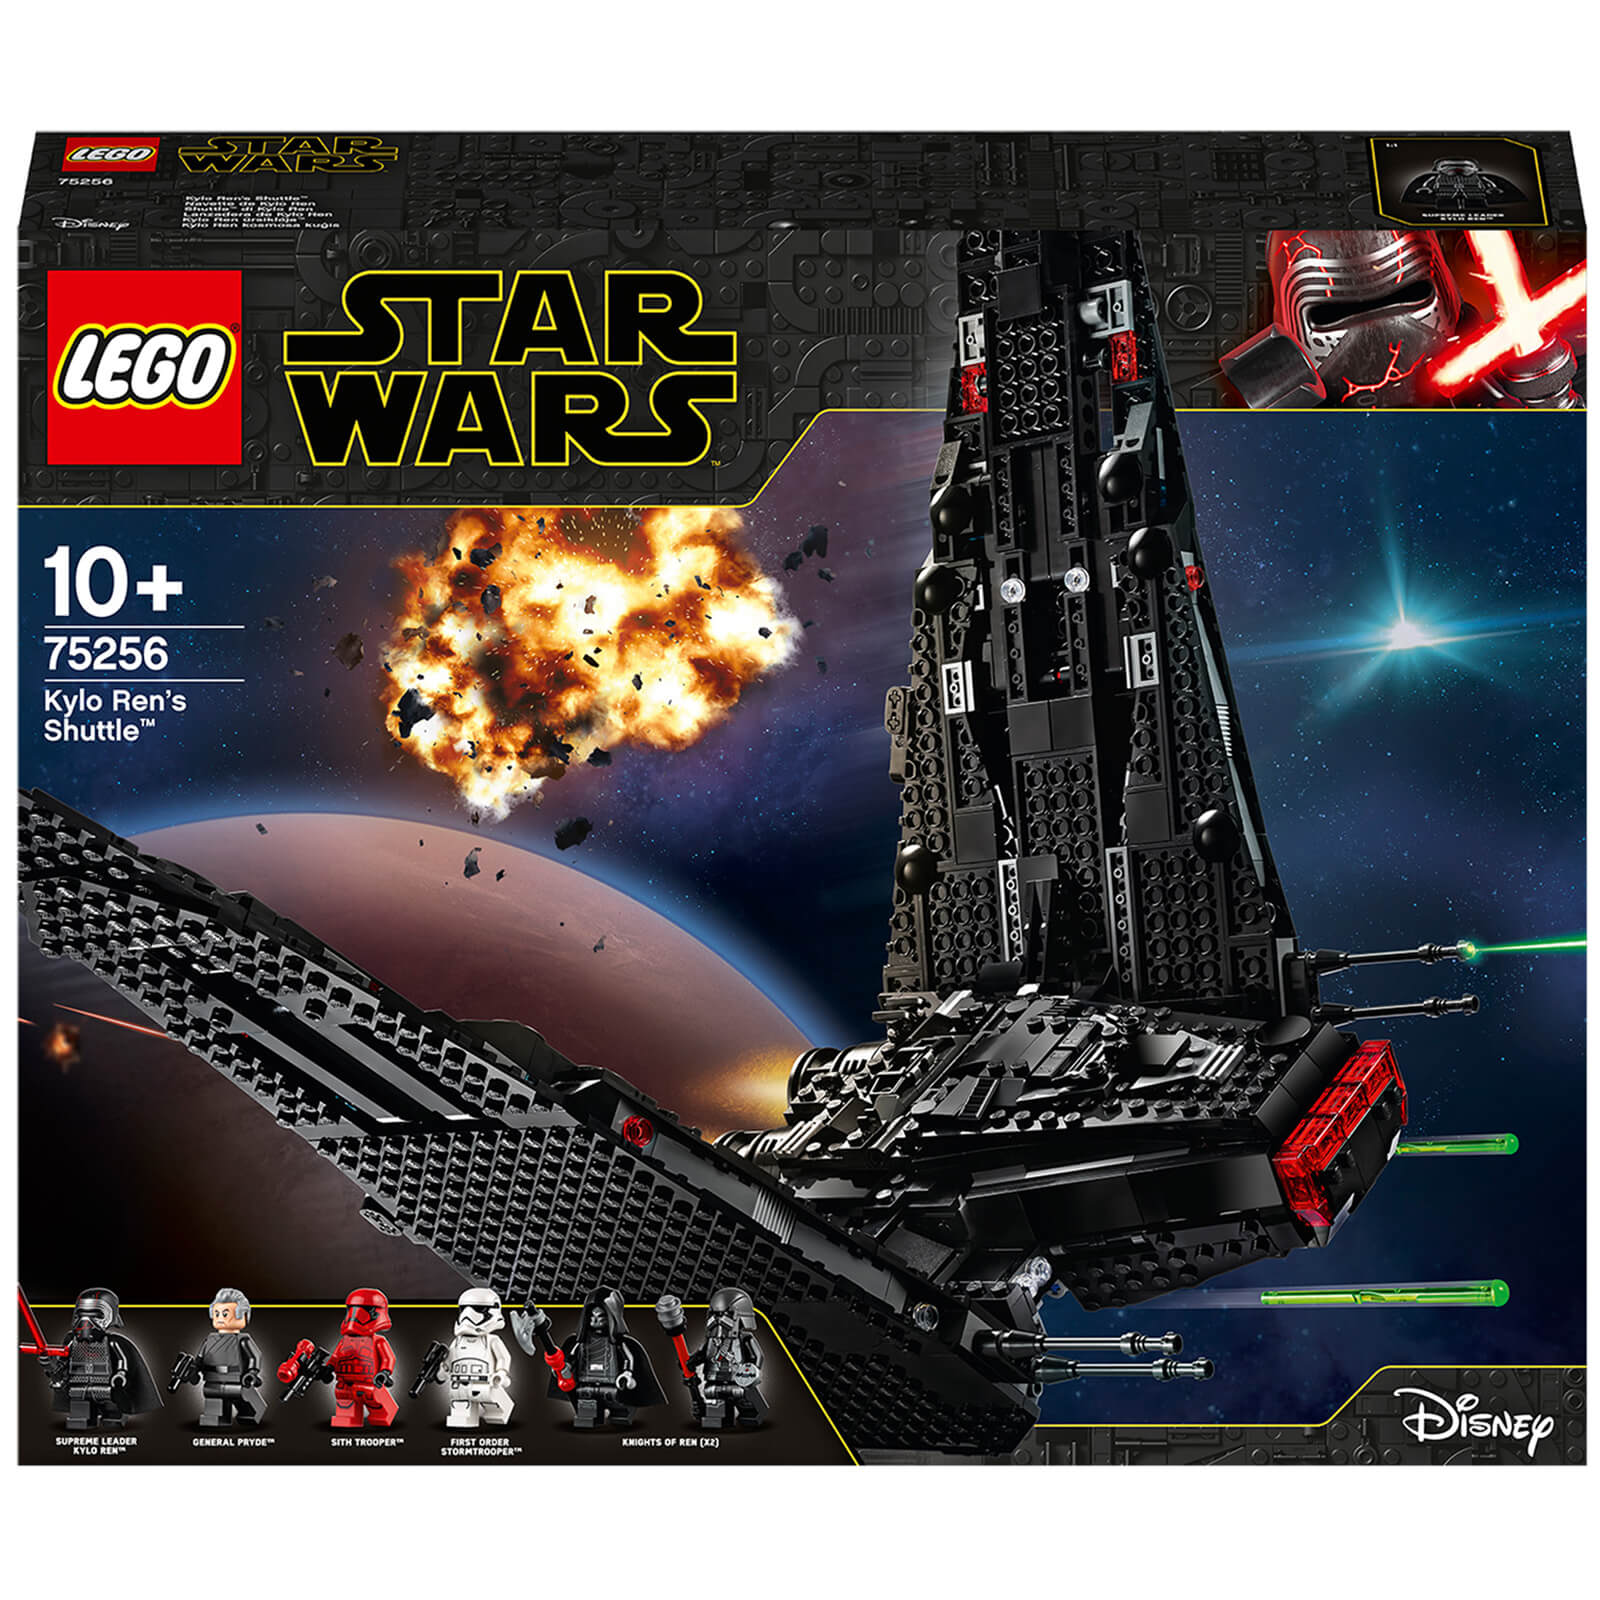 Image of LEGO Star Wars: Kylo Ren's Shuttle Building Set (75256)